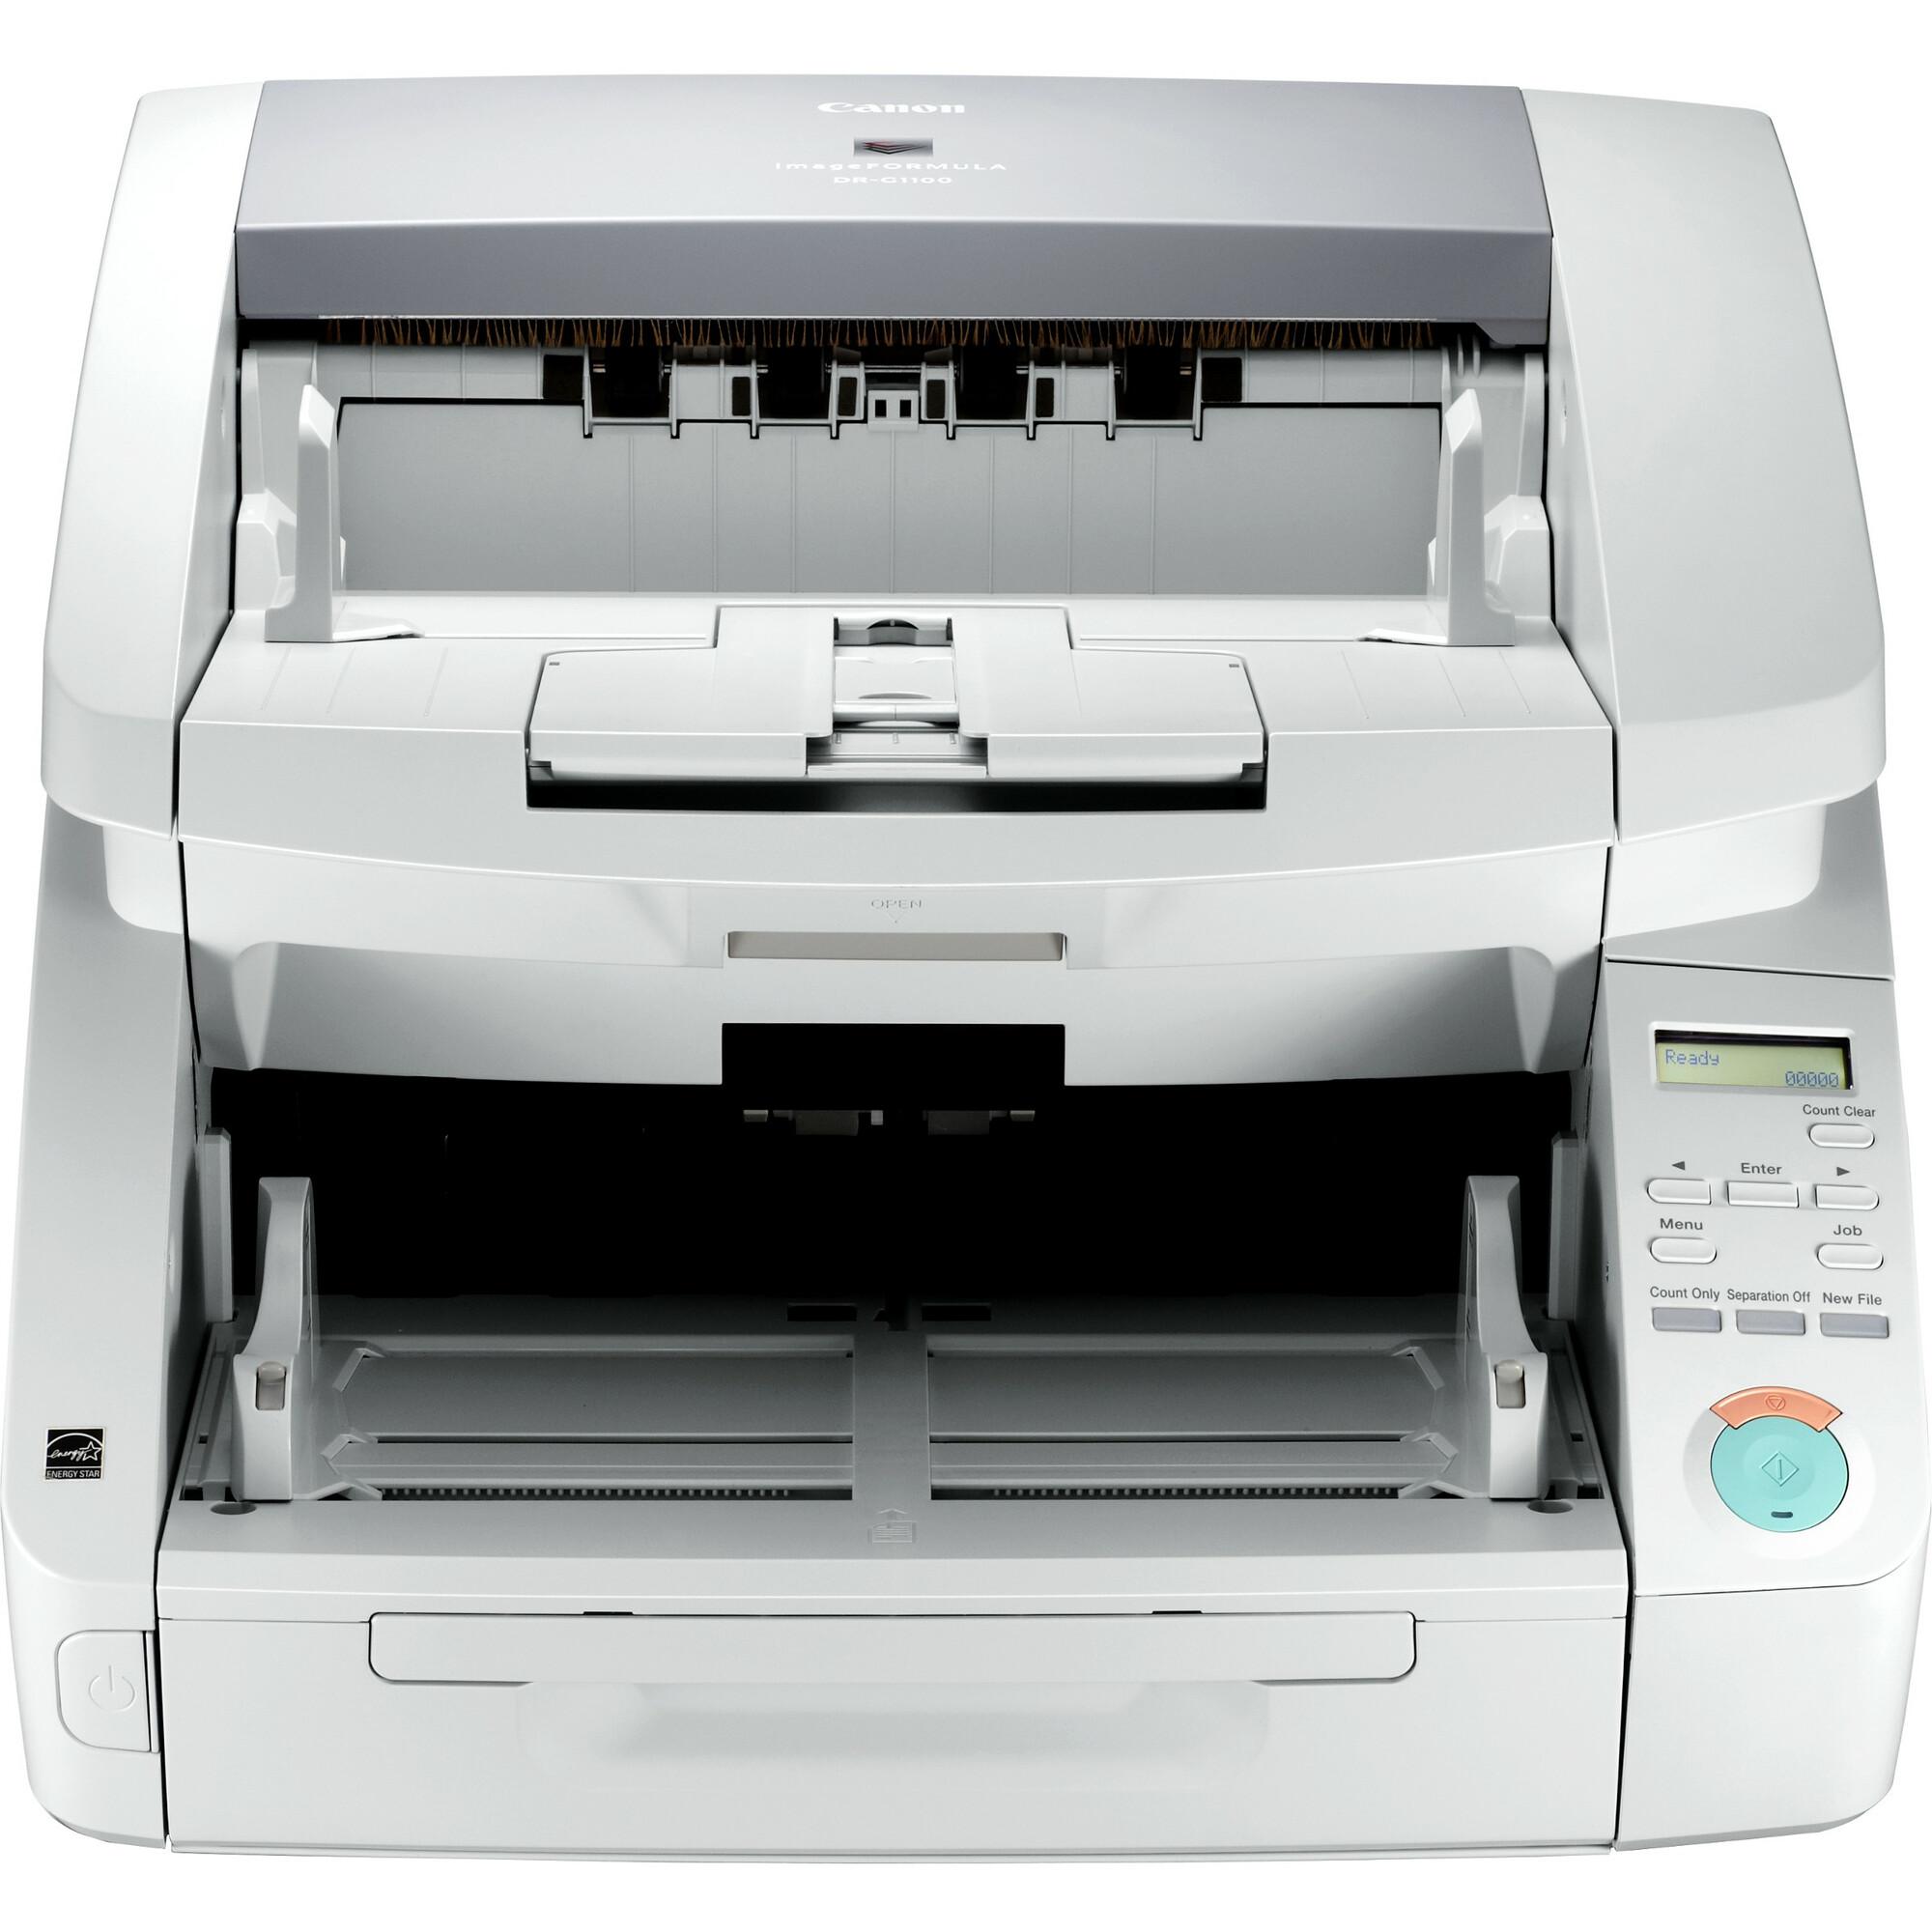 Canon DR-G1100 Sheetfed Scanner - 600 dpi Optical